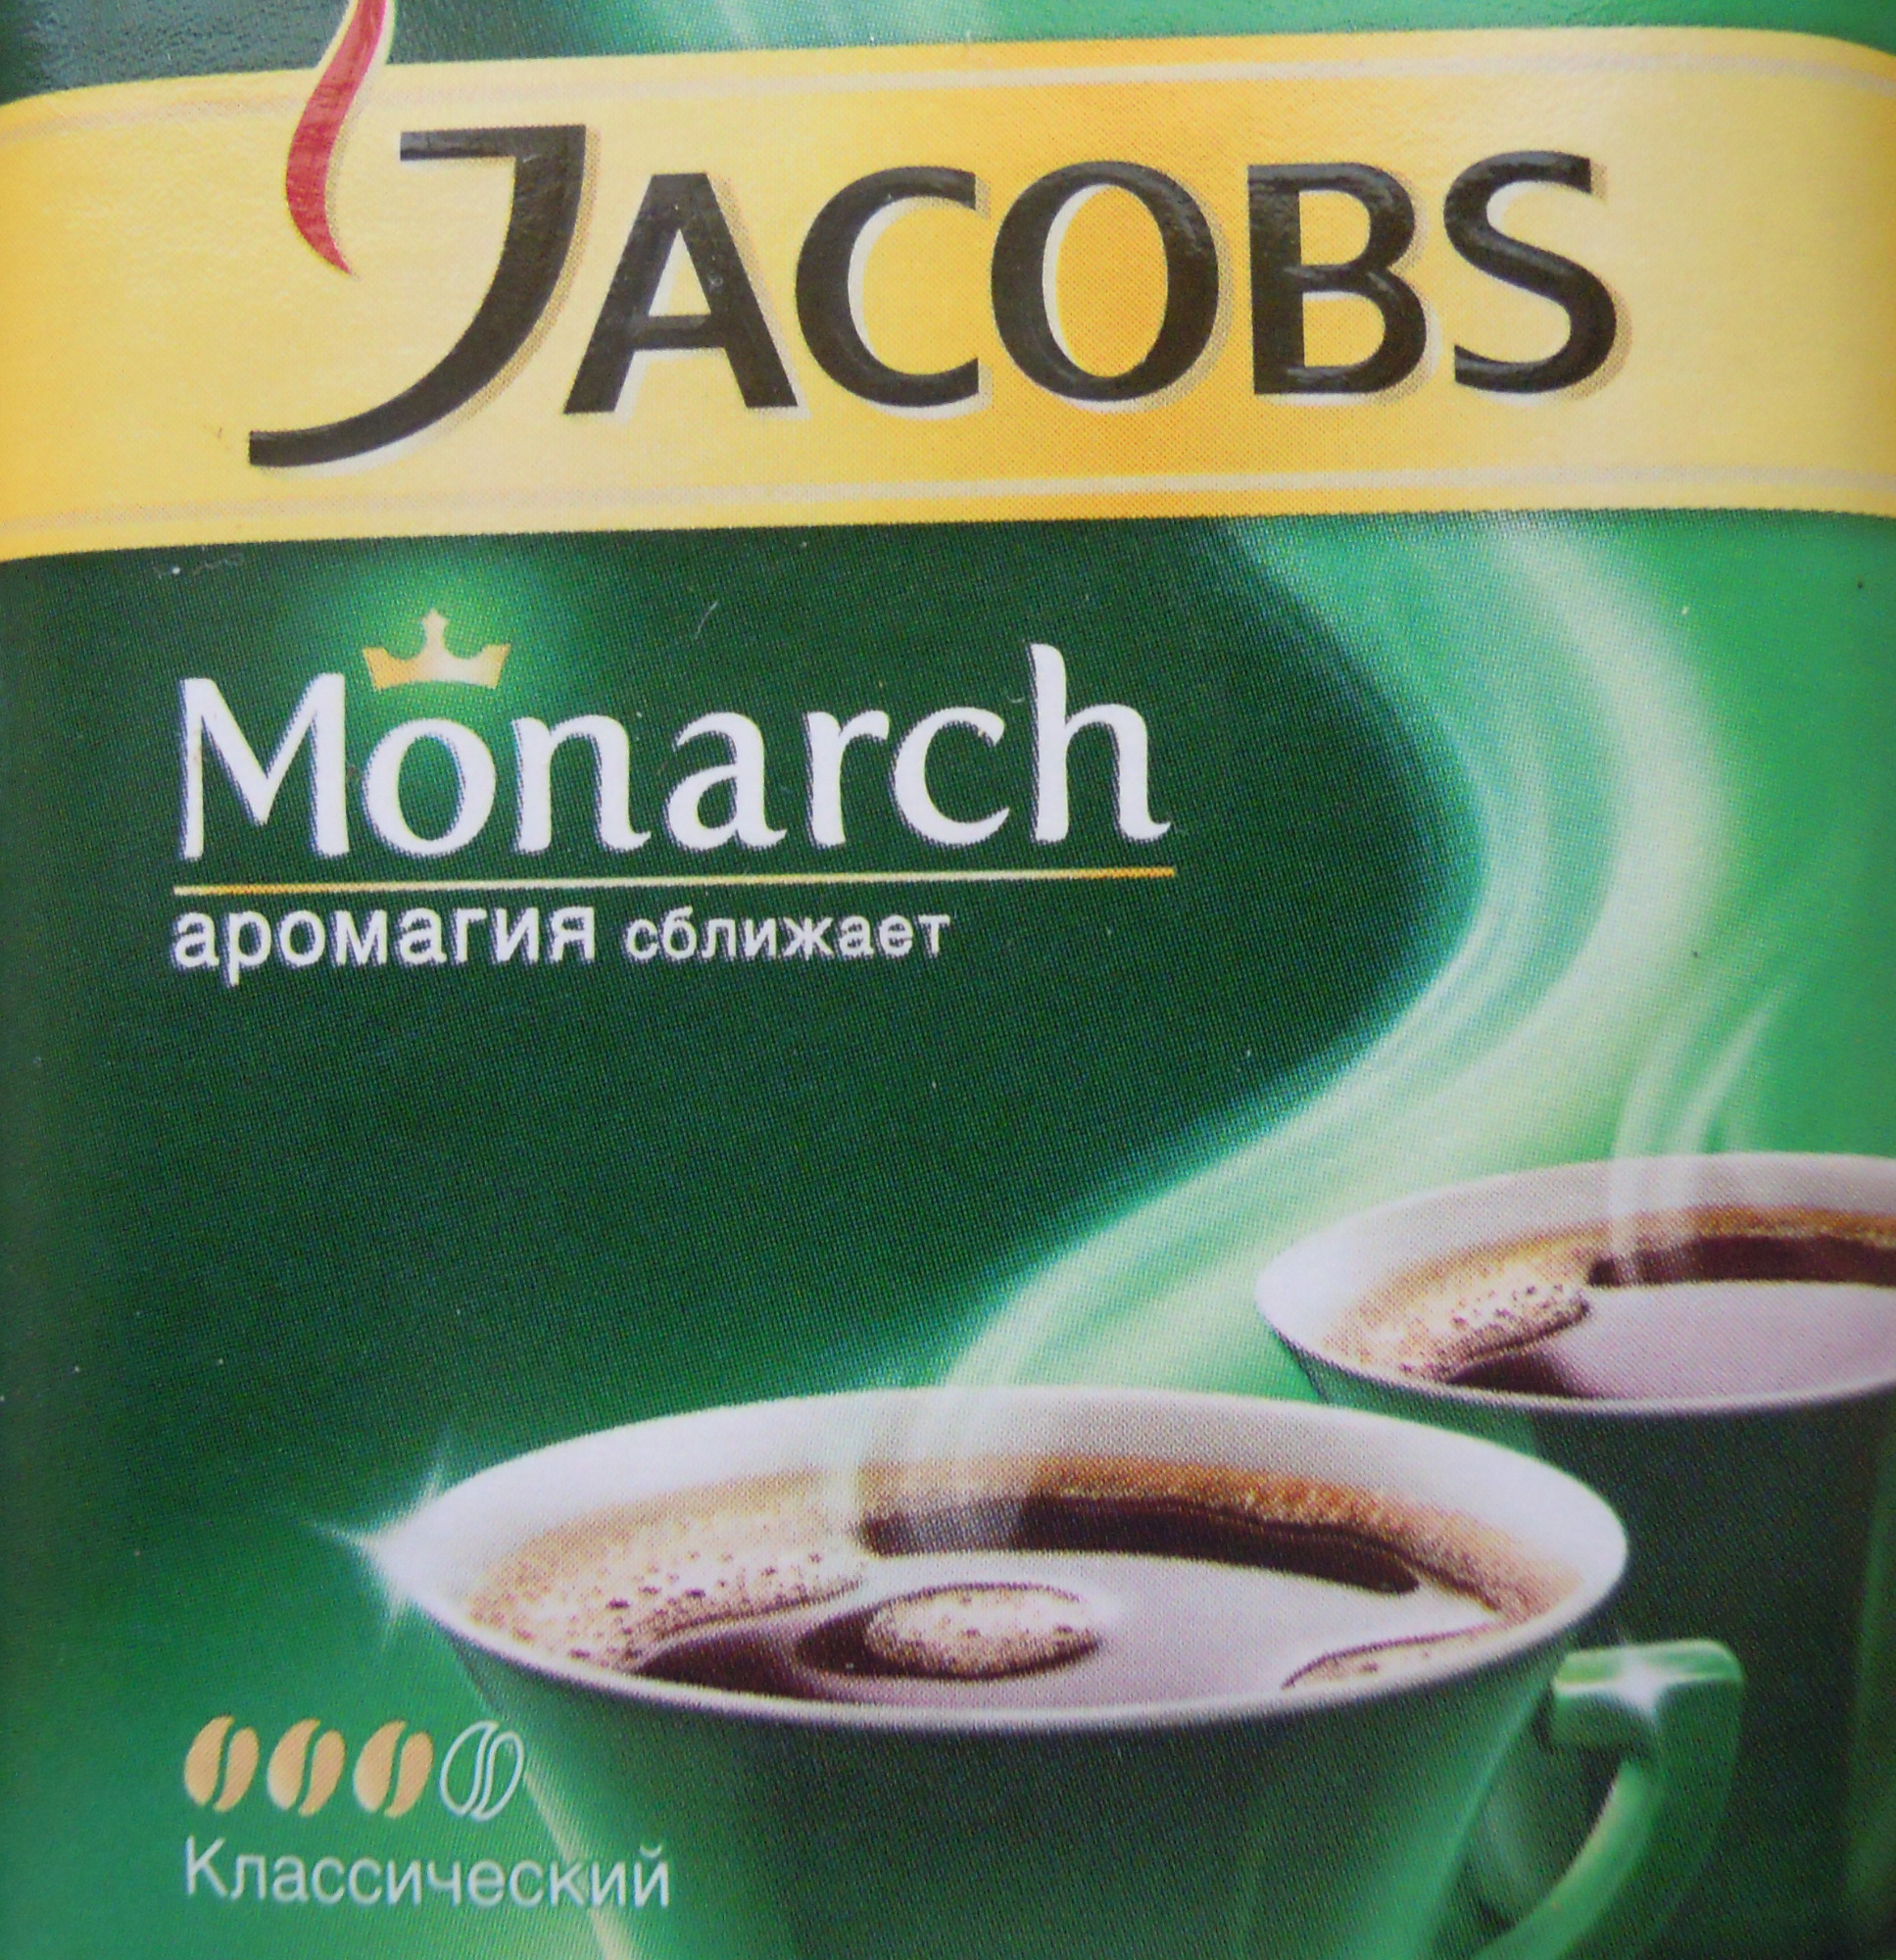 Jacobs Monarch классический - Product - ru